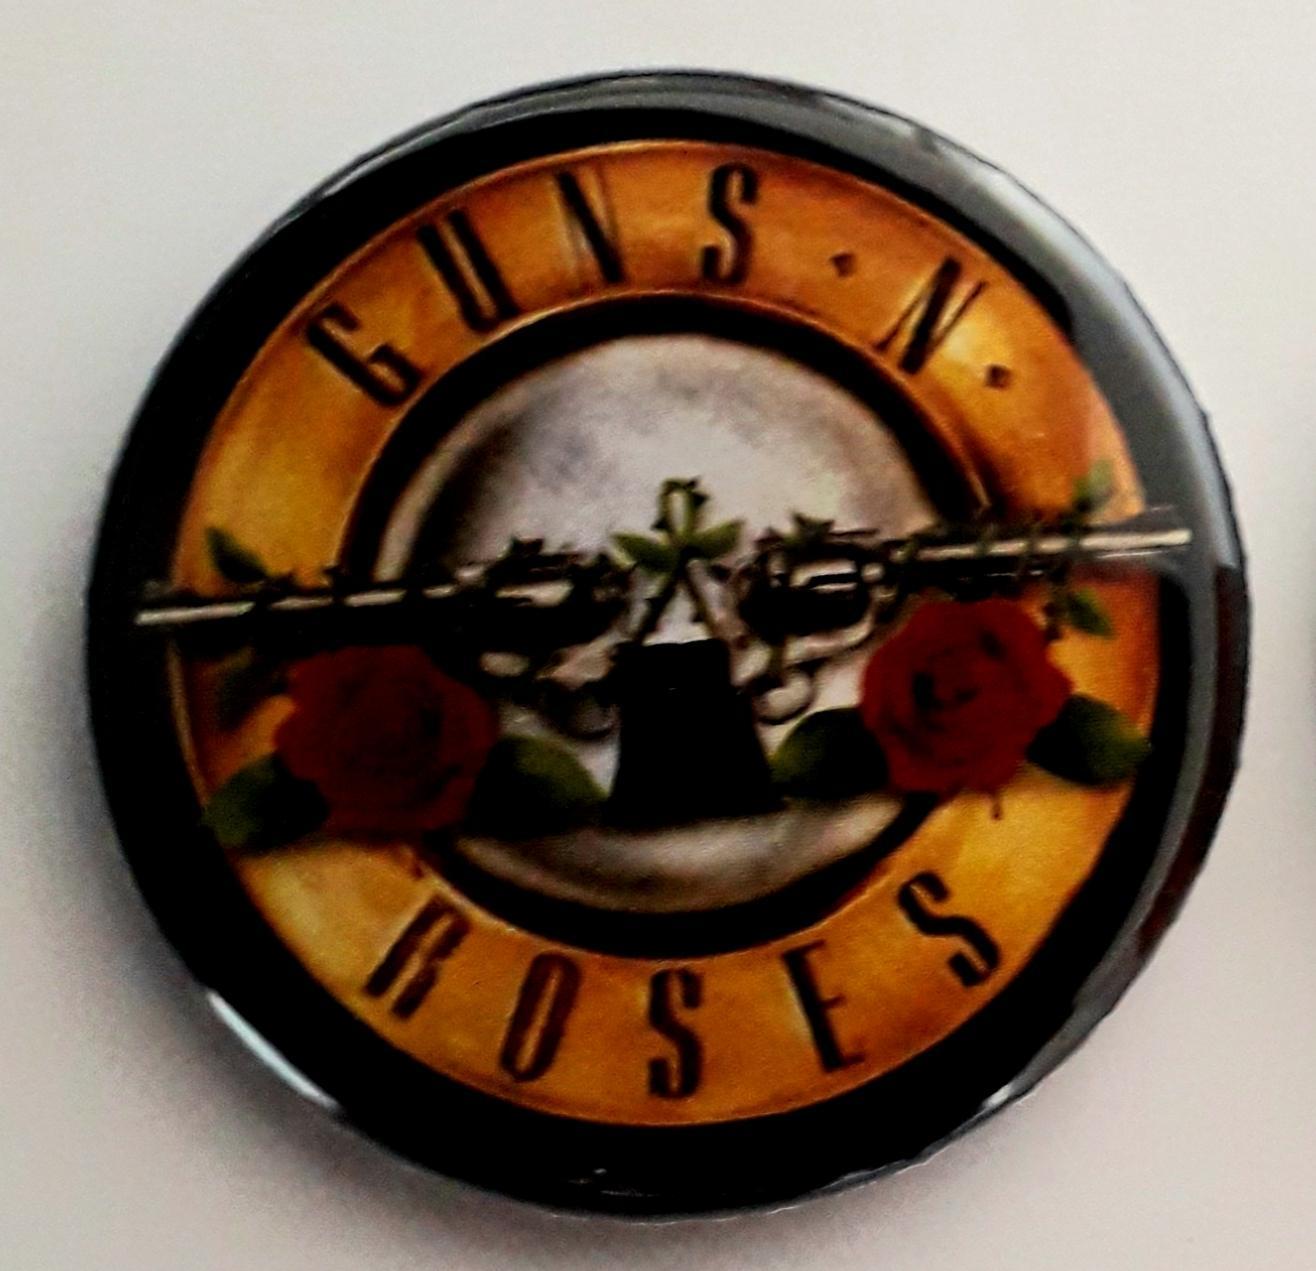 Botton Favartes Guns n' Roses